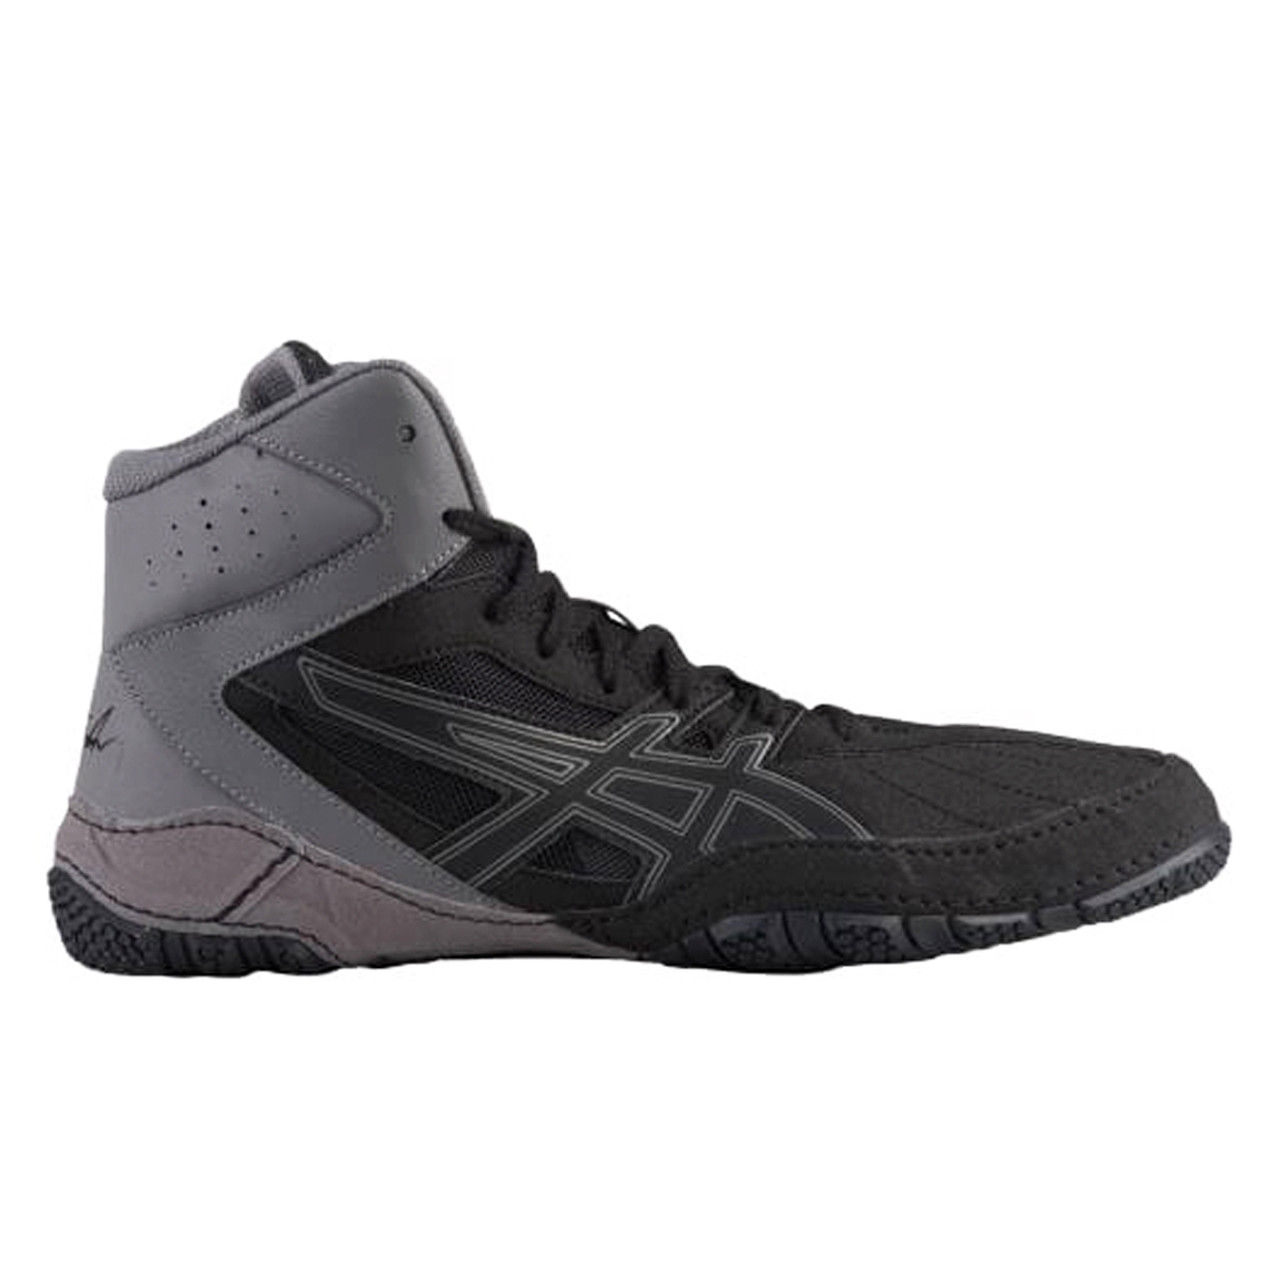 51af8a5d94b59b Asics Mat Control Men s Wrestling Shoes - Black